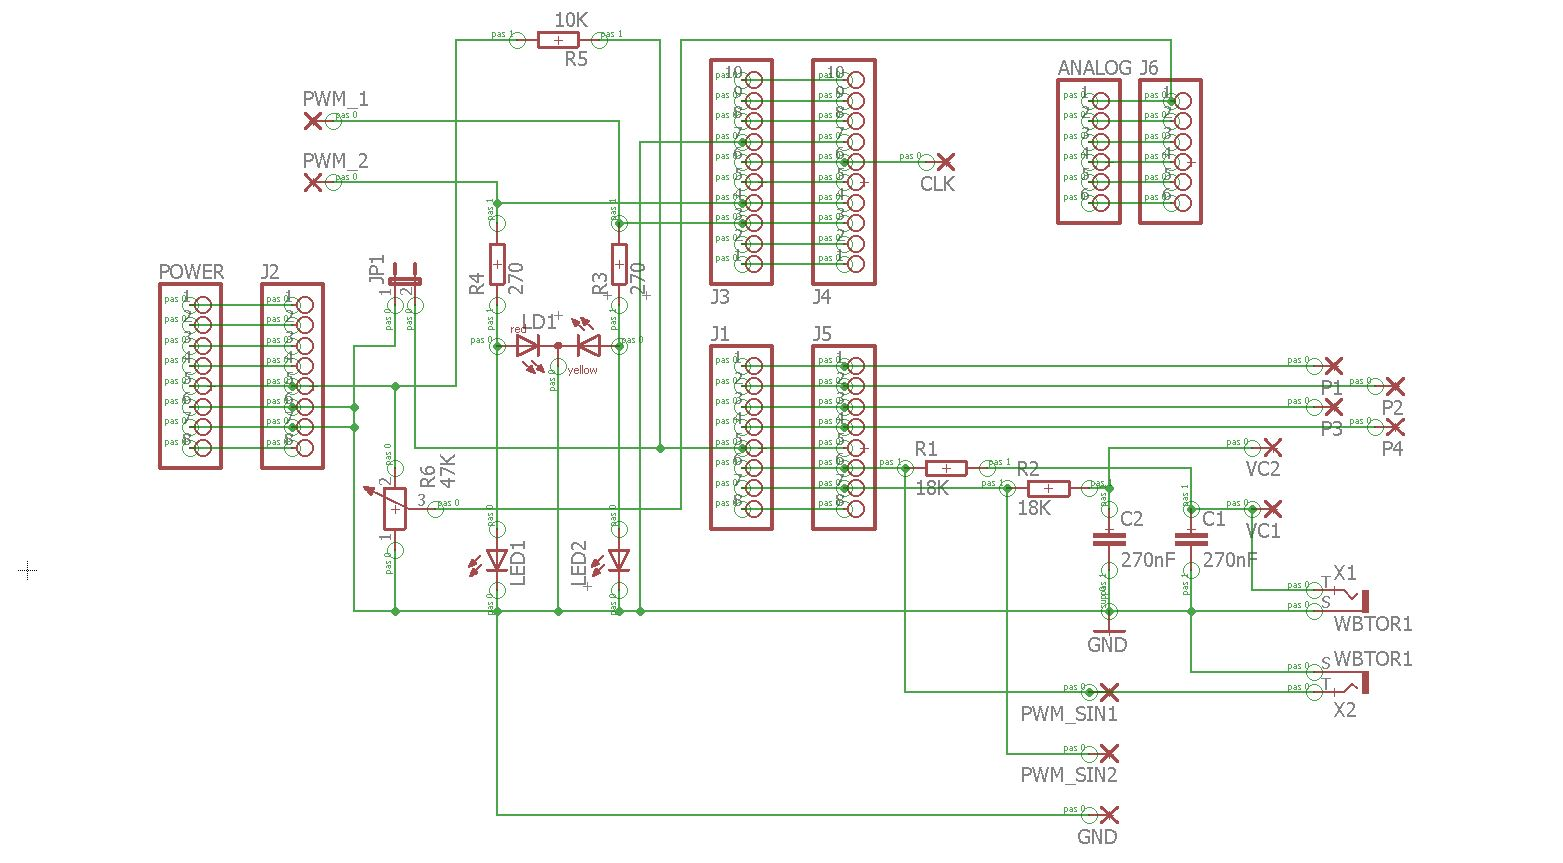 Pwm board circuit diagram gihp5gn861